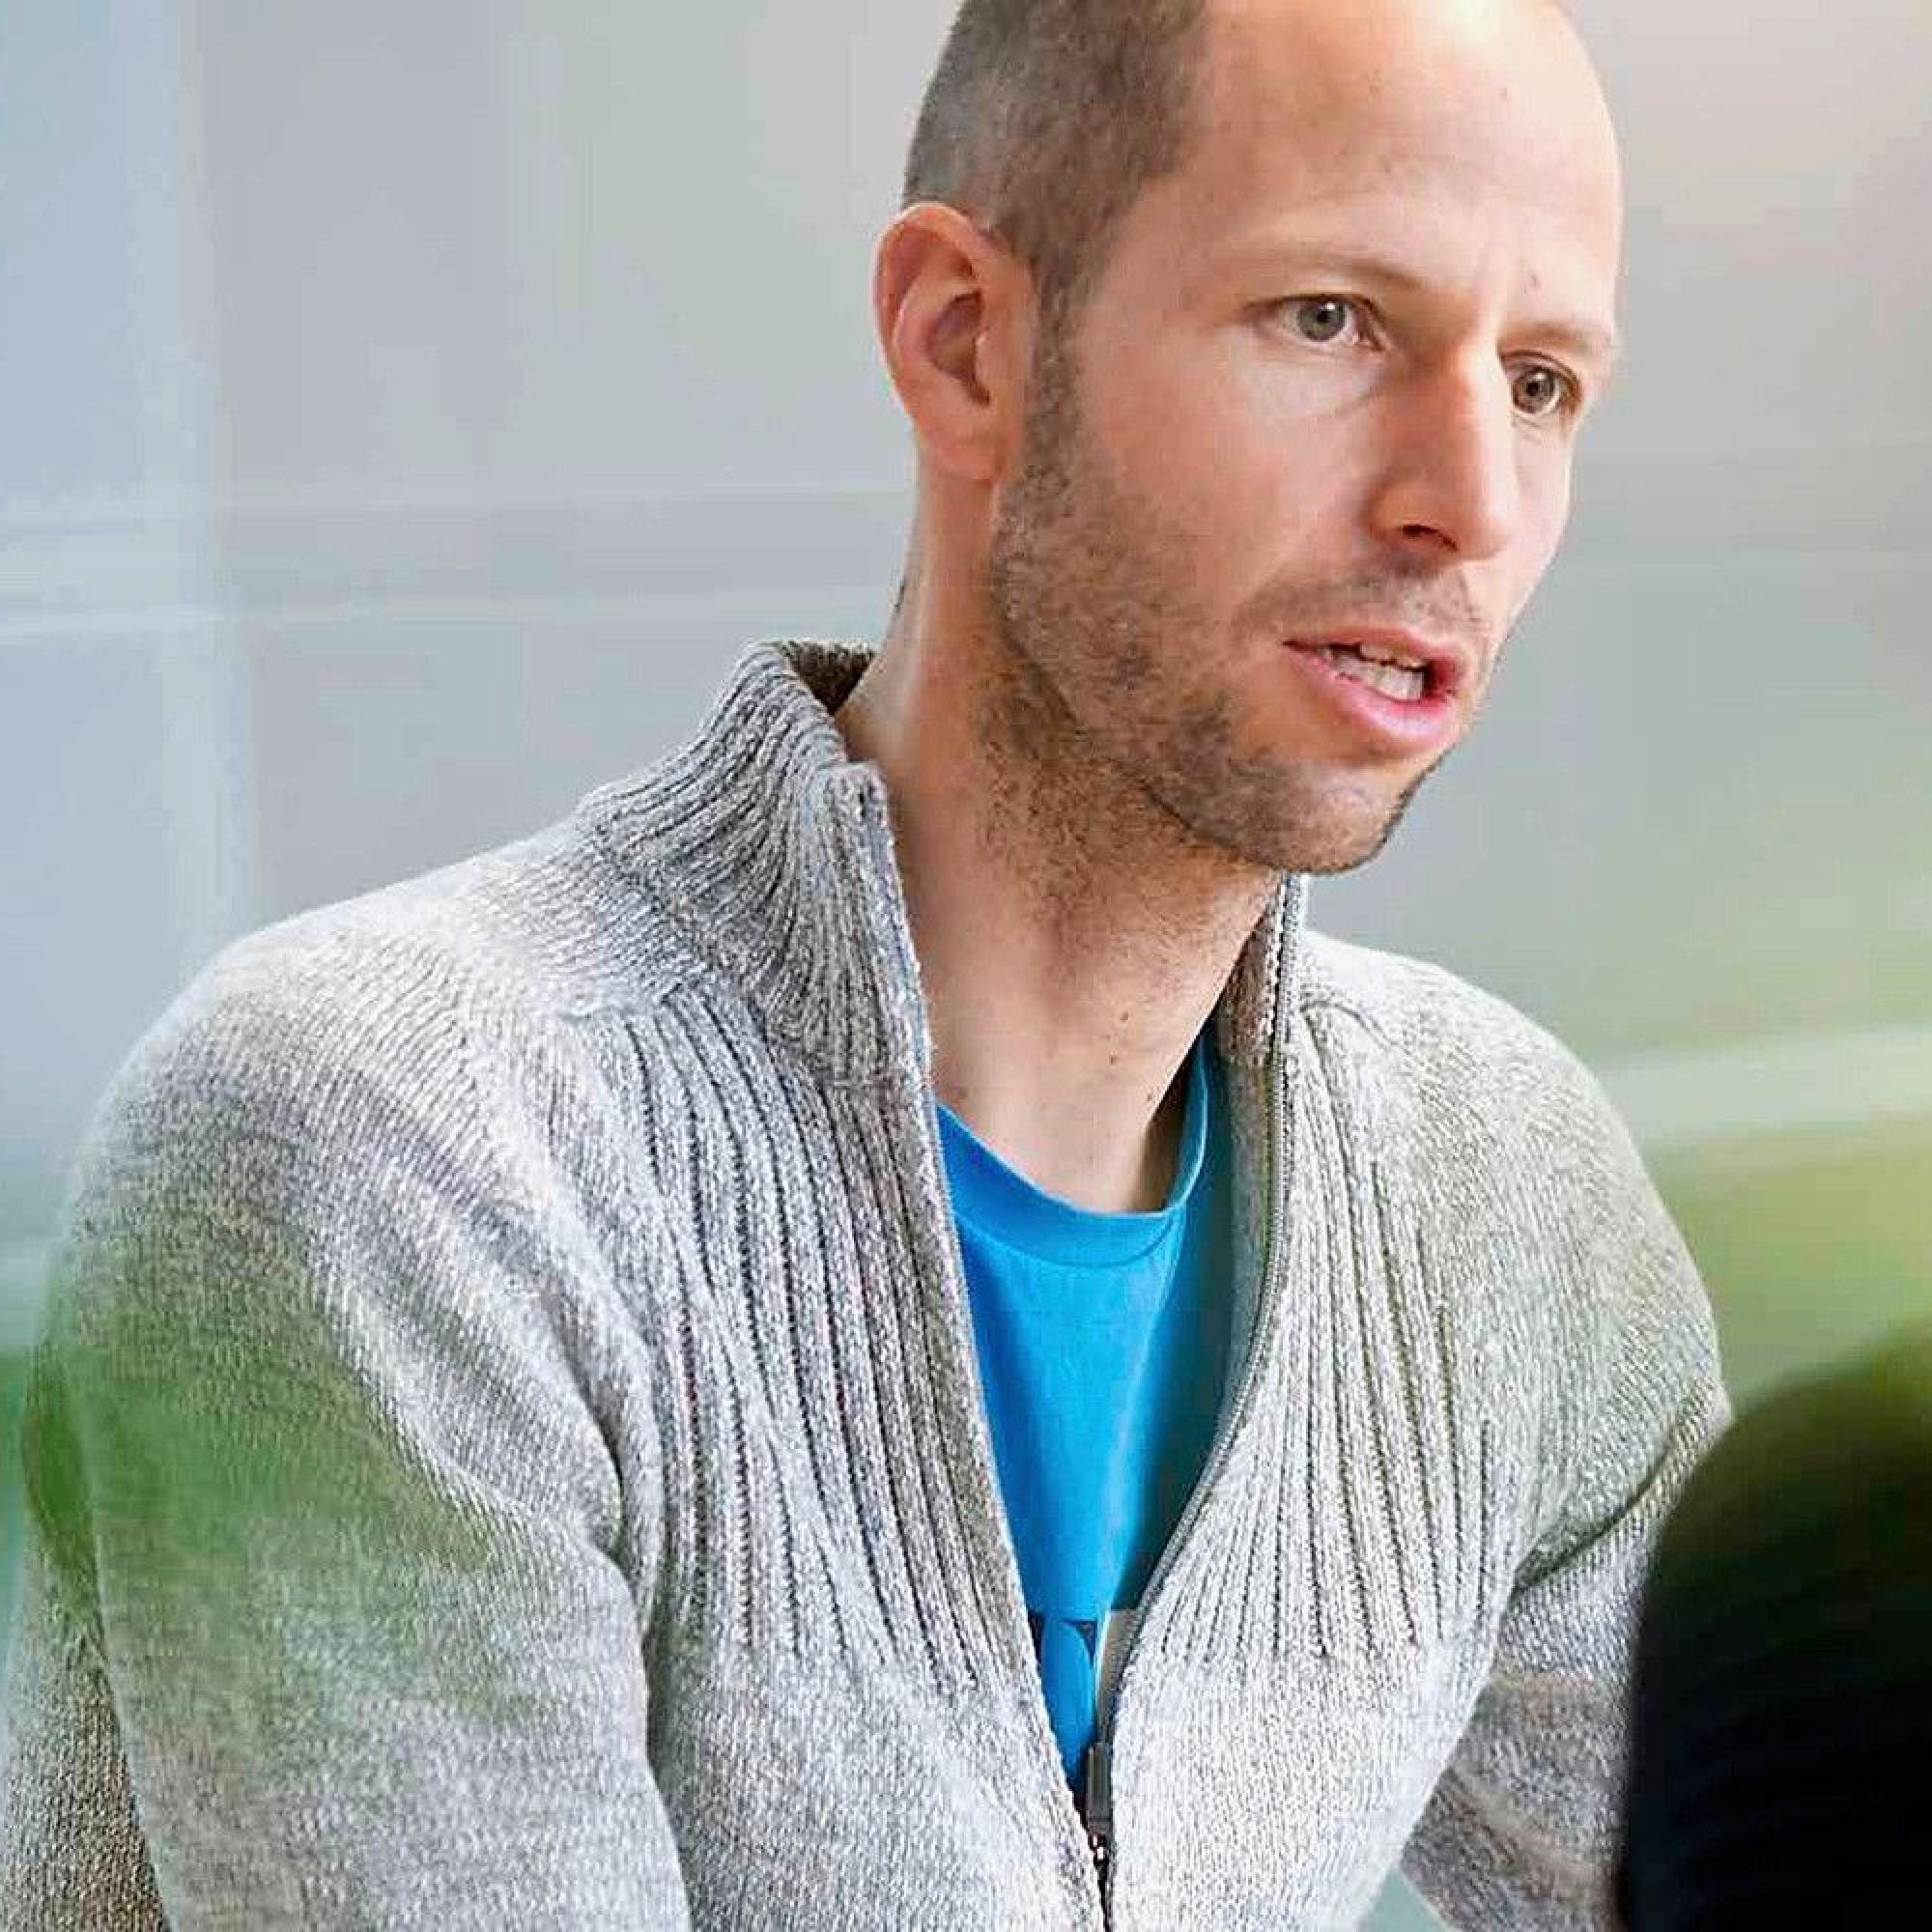 Umweltingenieurforscher Christoph Ort